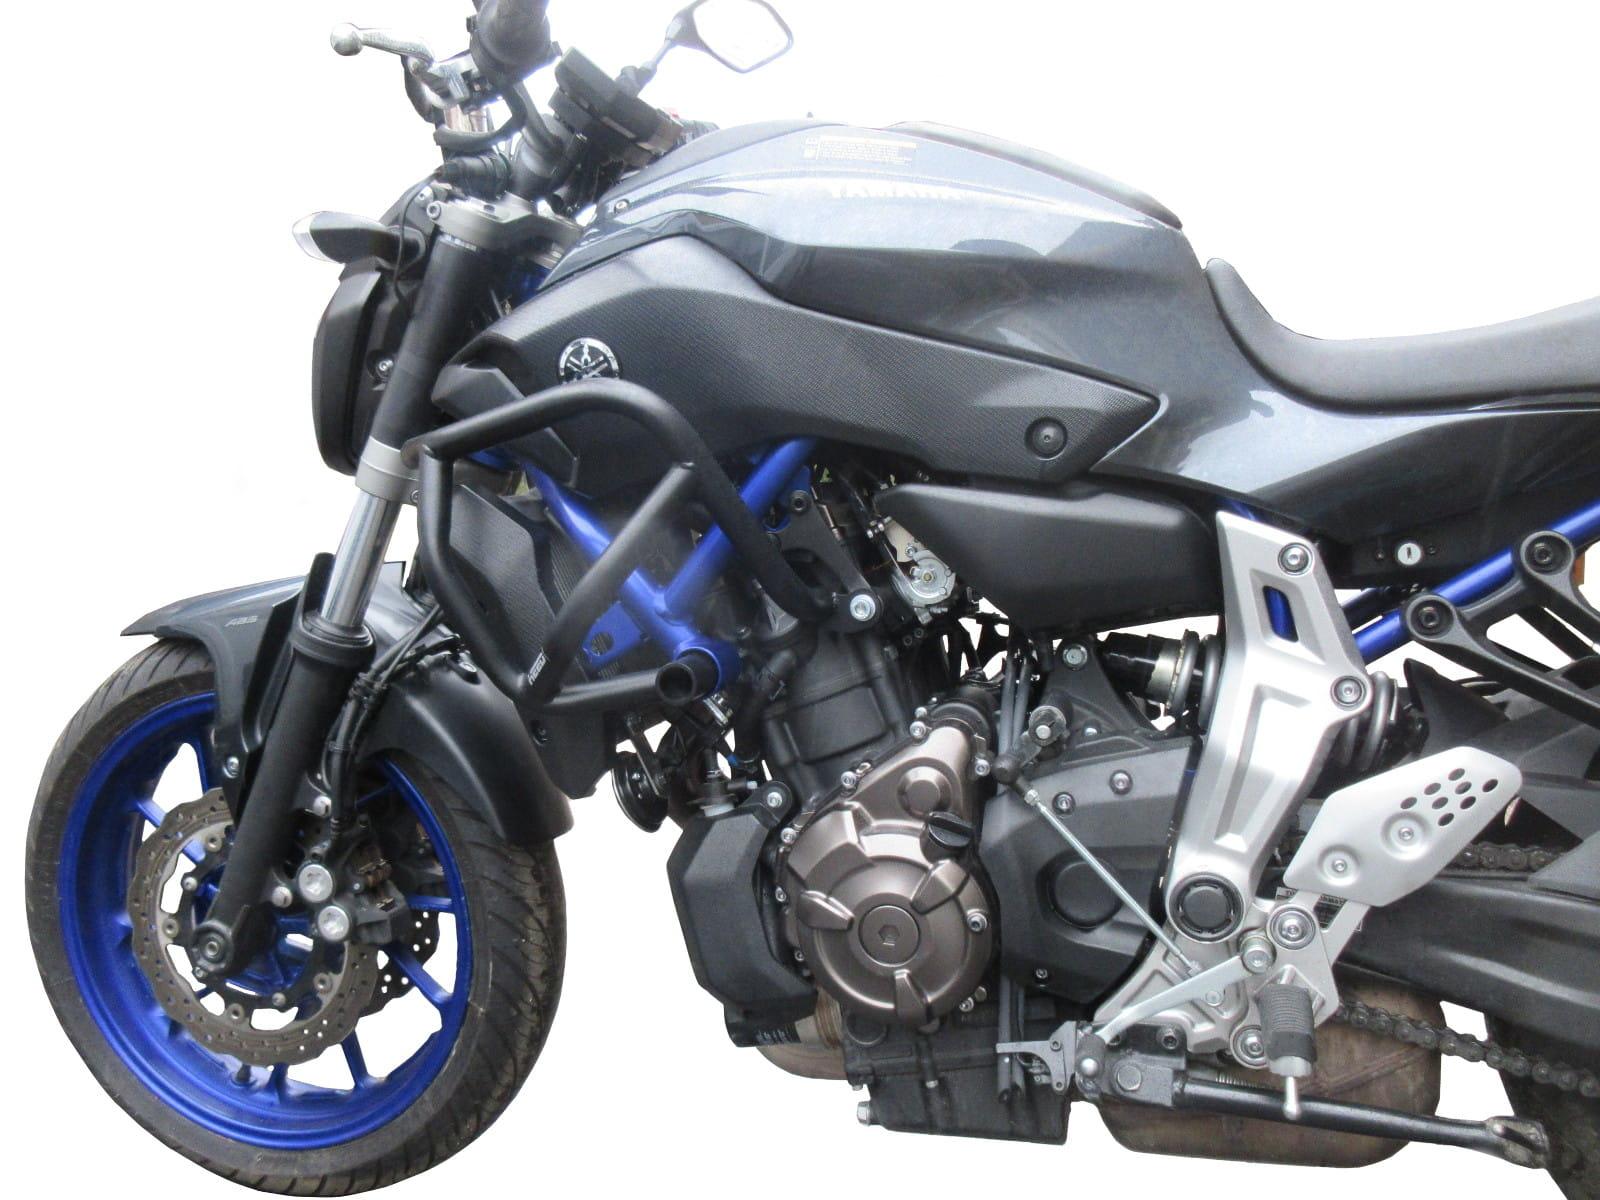 Crash bars for Yamaha MT-07 (2014 - 2017)